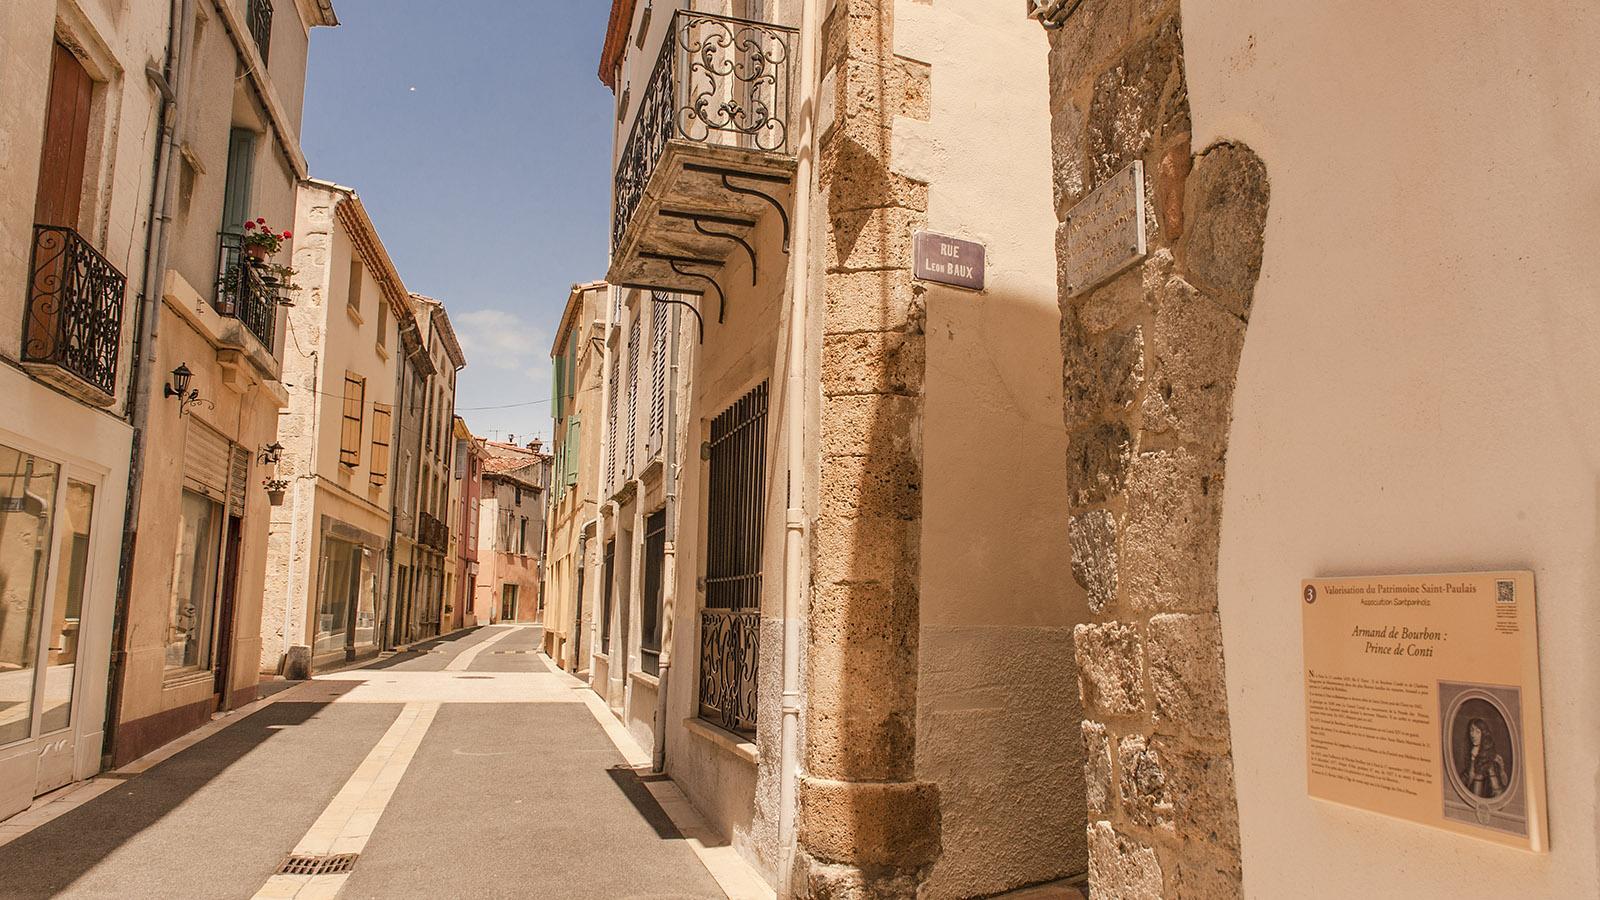 Saint-Paul-de-Fenouillet: Rue Arago. Foto: Hilke Maunder